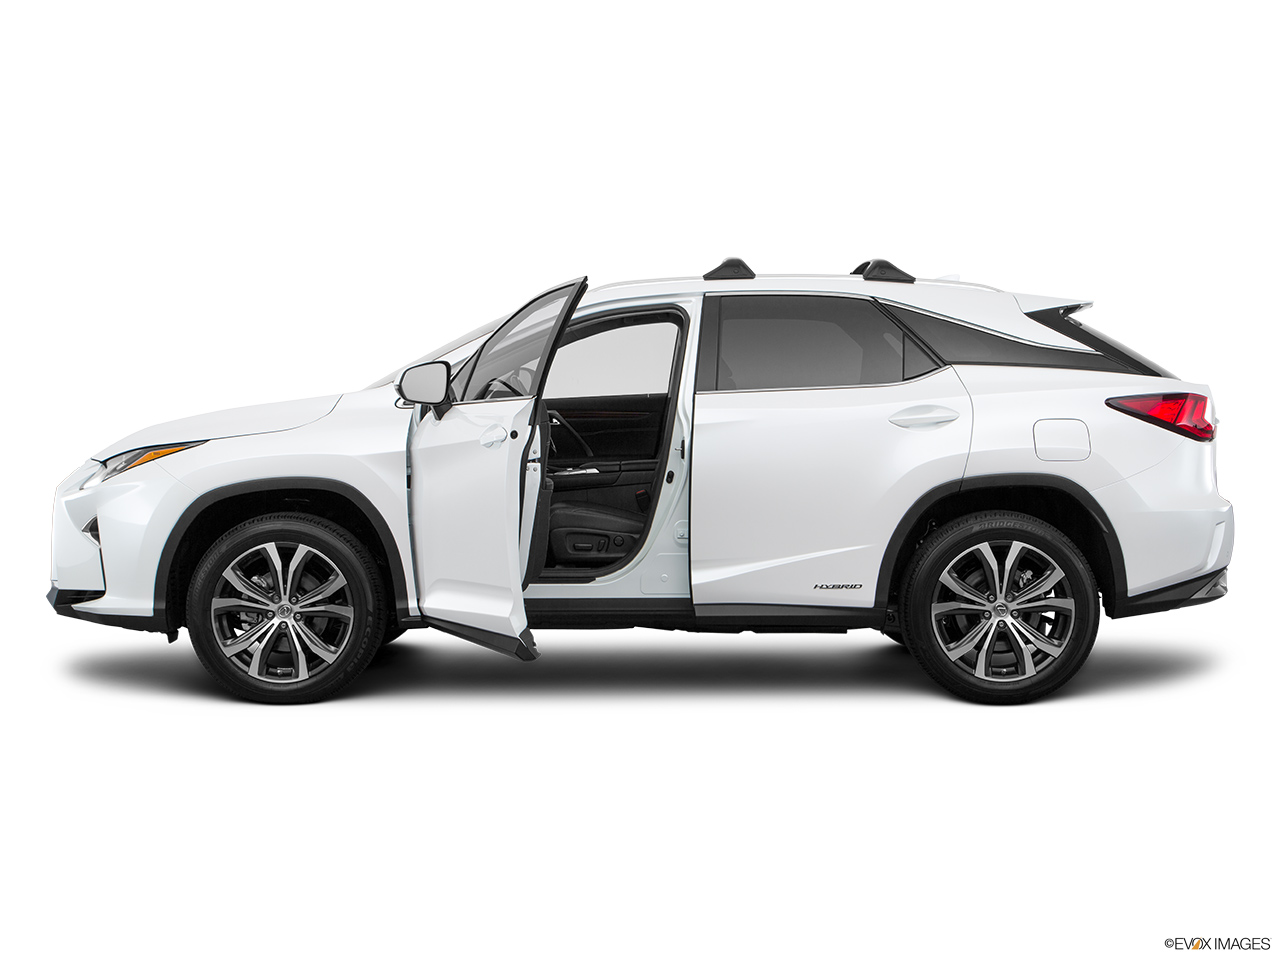 lexus rx 2016 350 premier plus in saudi arabia new car. Black Bedroom Furniture Sets. Home Design Ideas